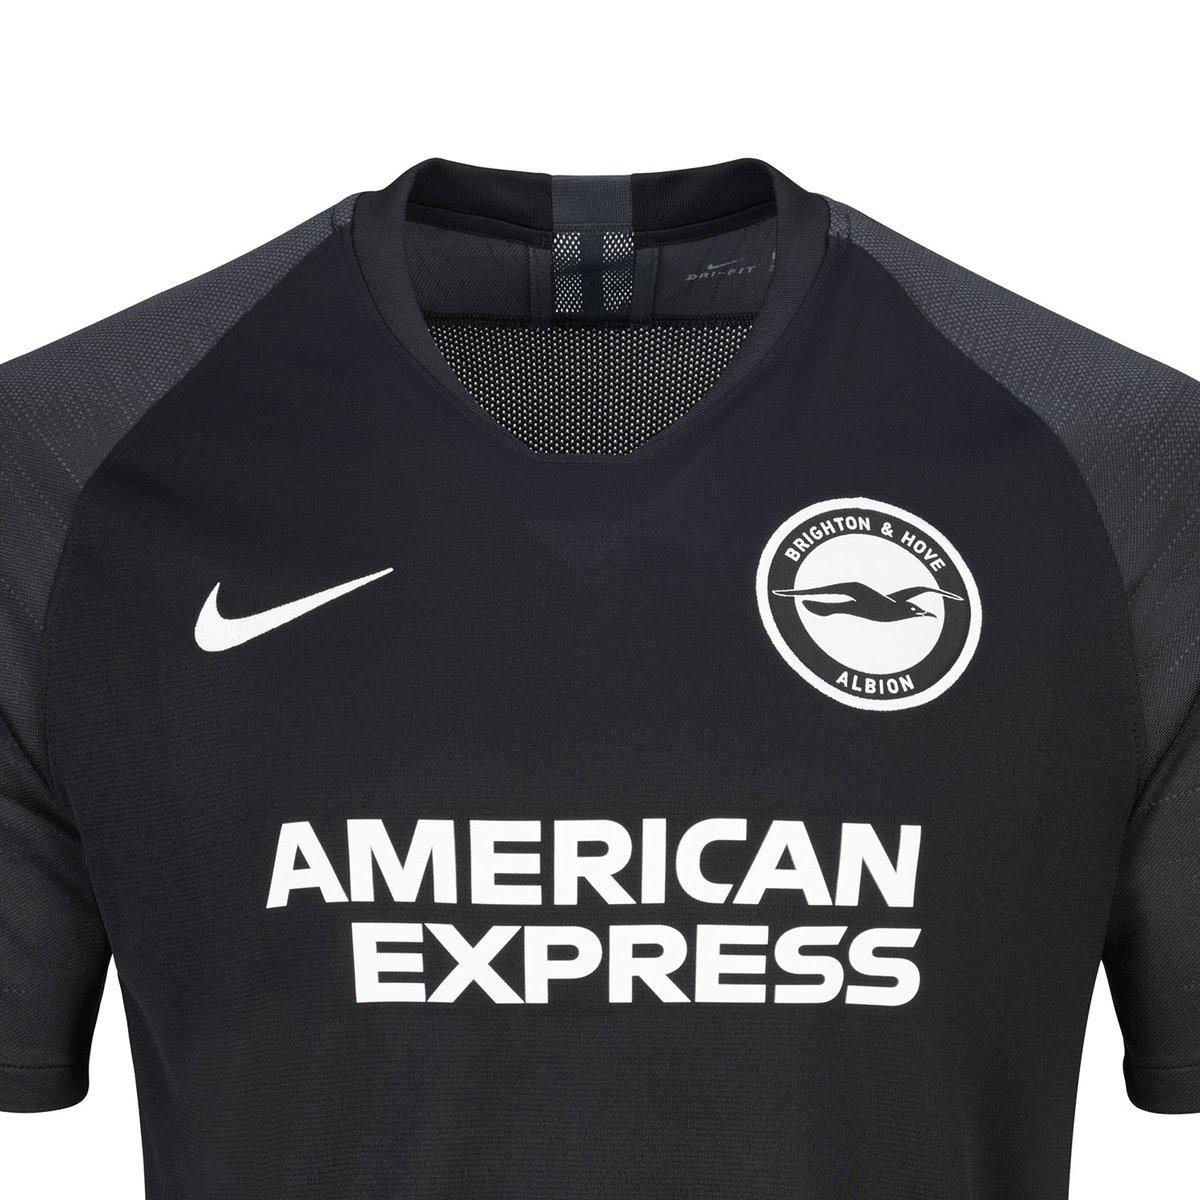 60c7dfddfb3 Football Shirts (@FootballShirts) | Twitter